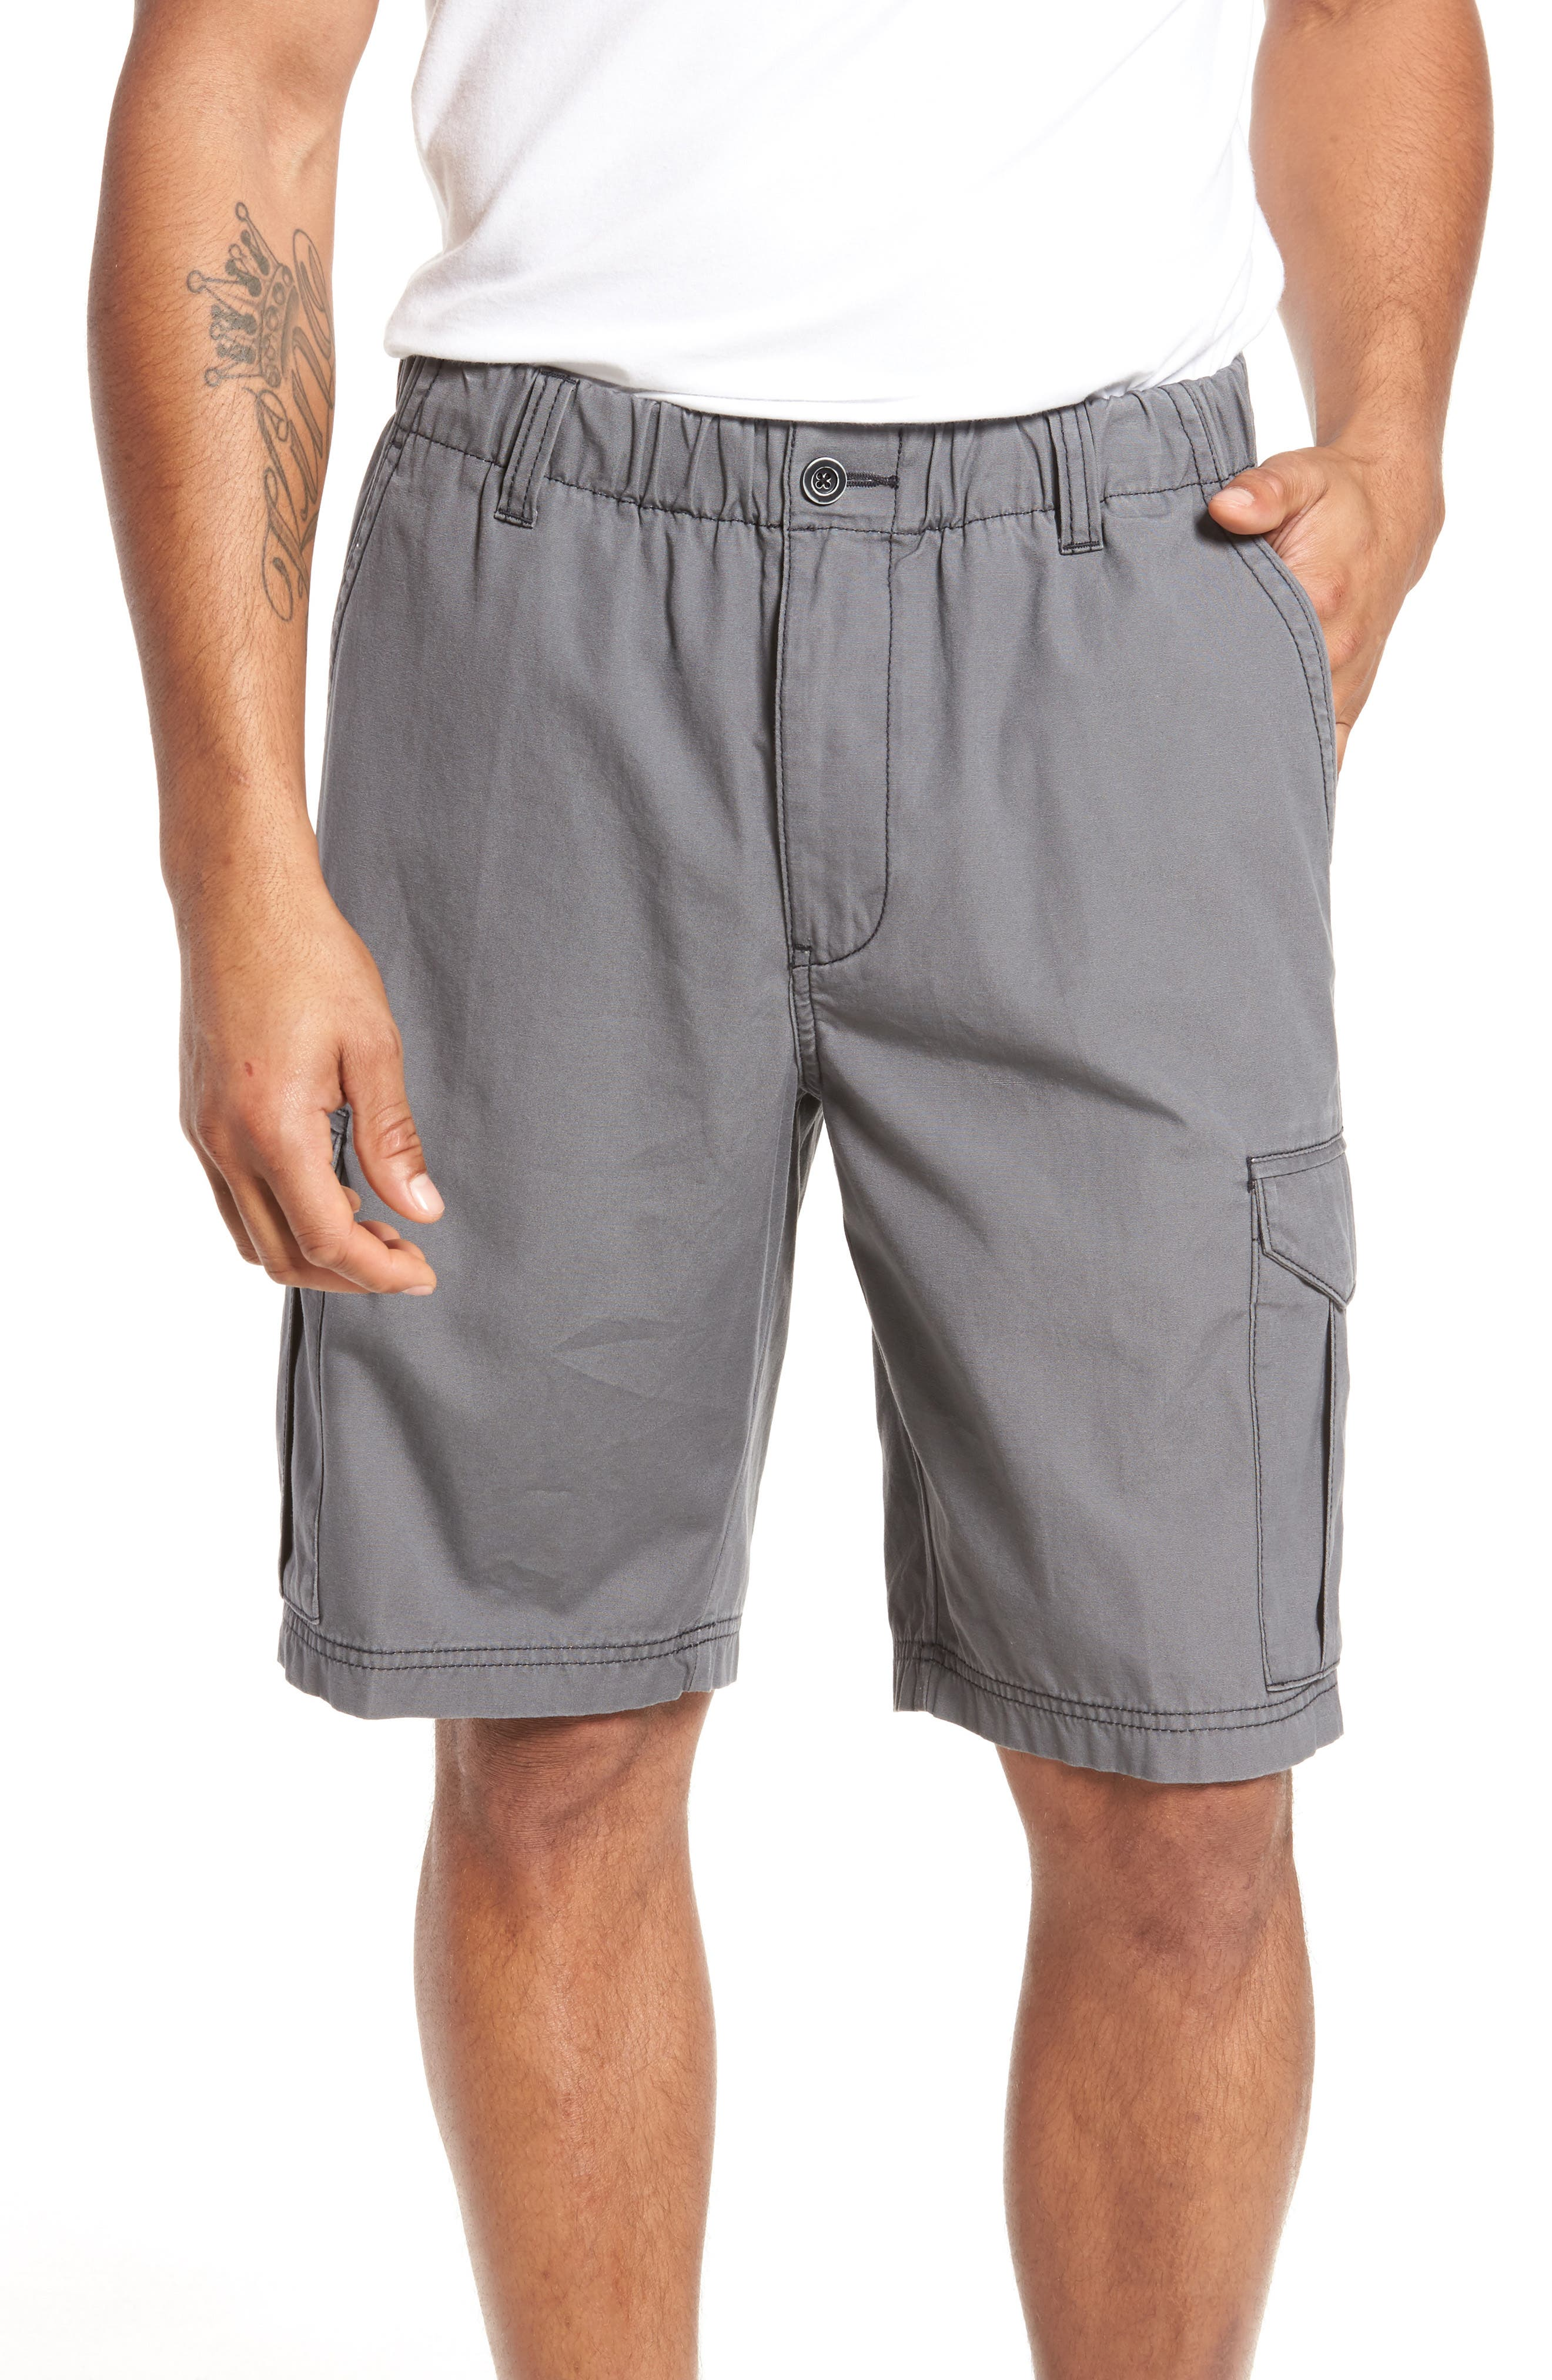 Island Survivalist Cargo Shorts,                             Main thumbnail 1, color,                             050